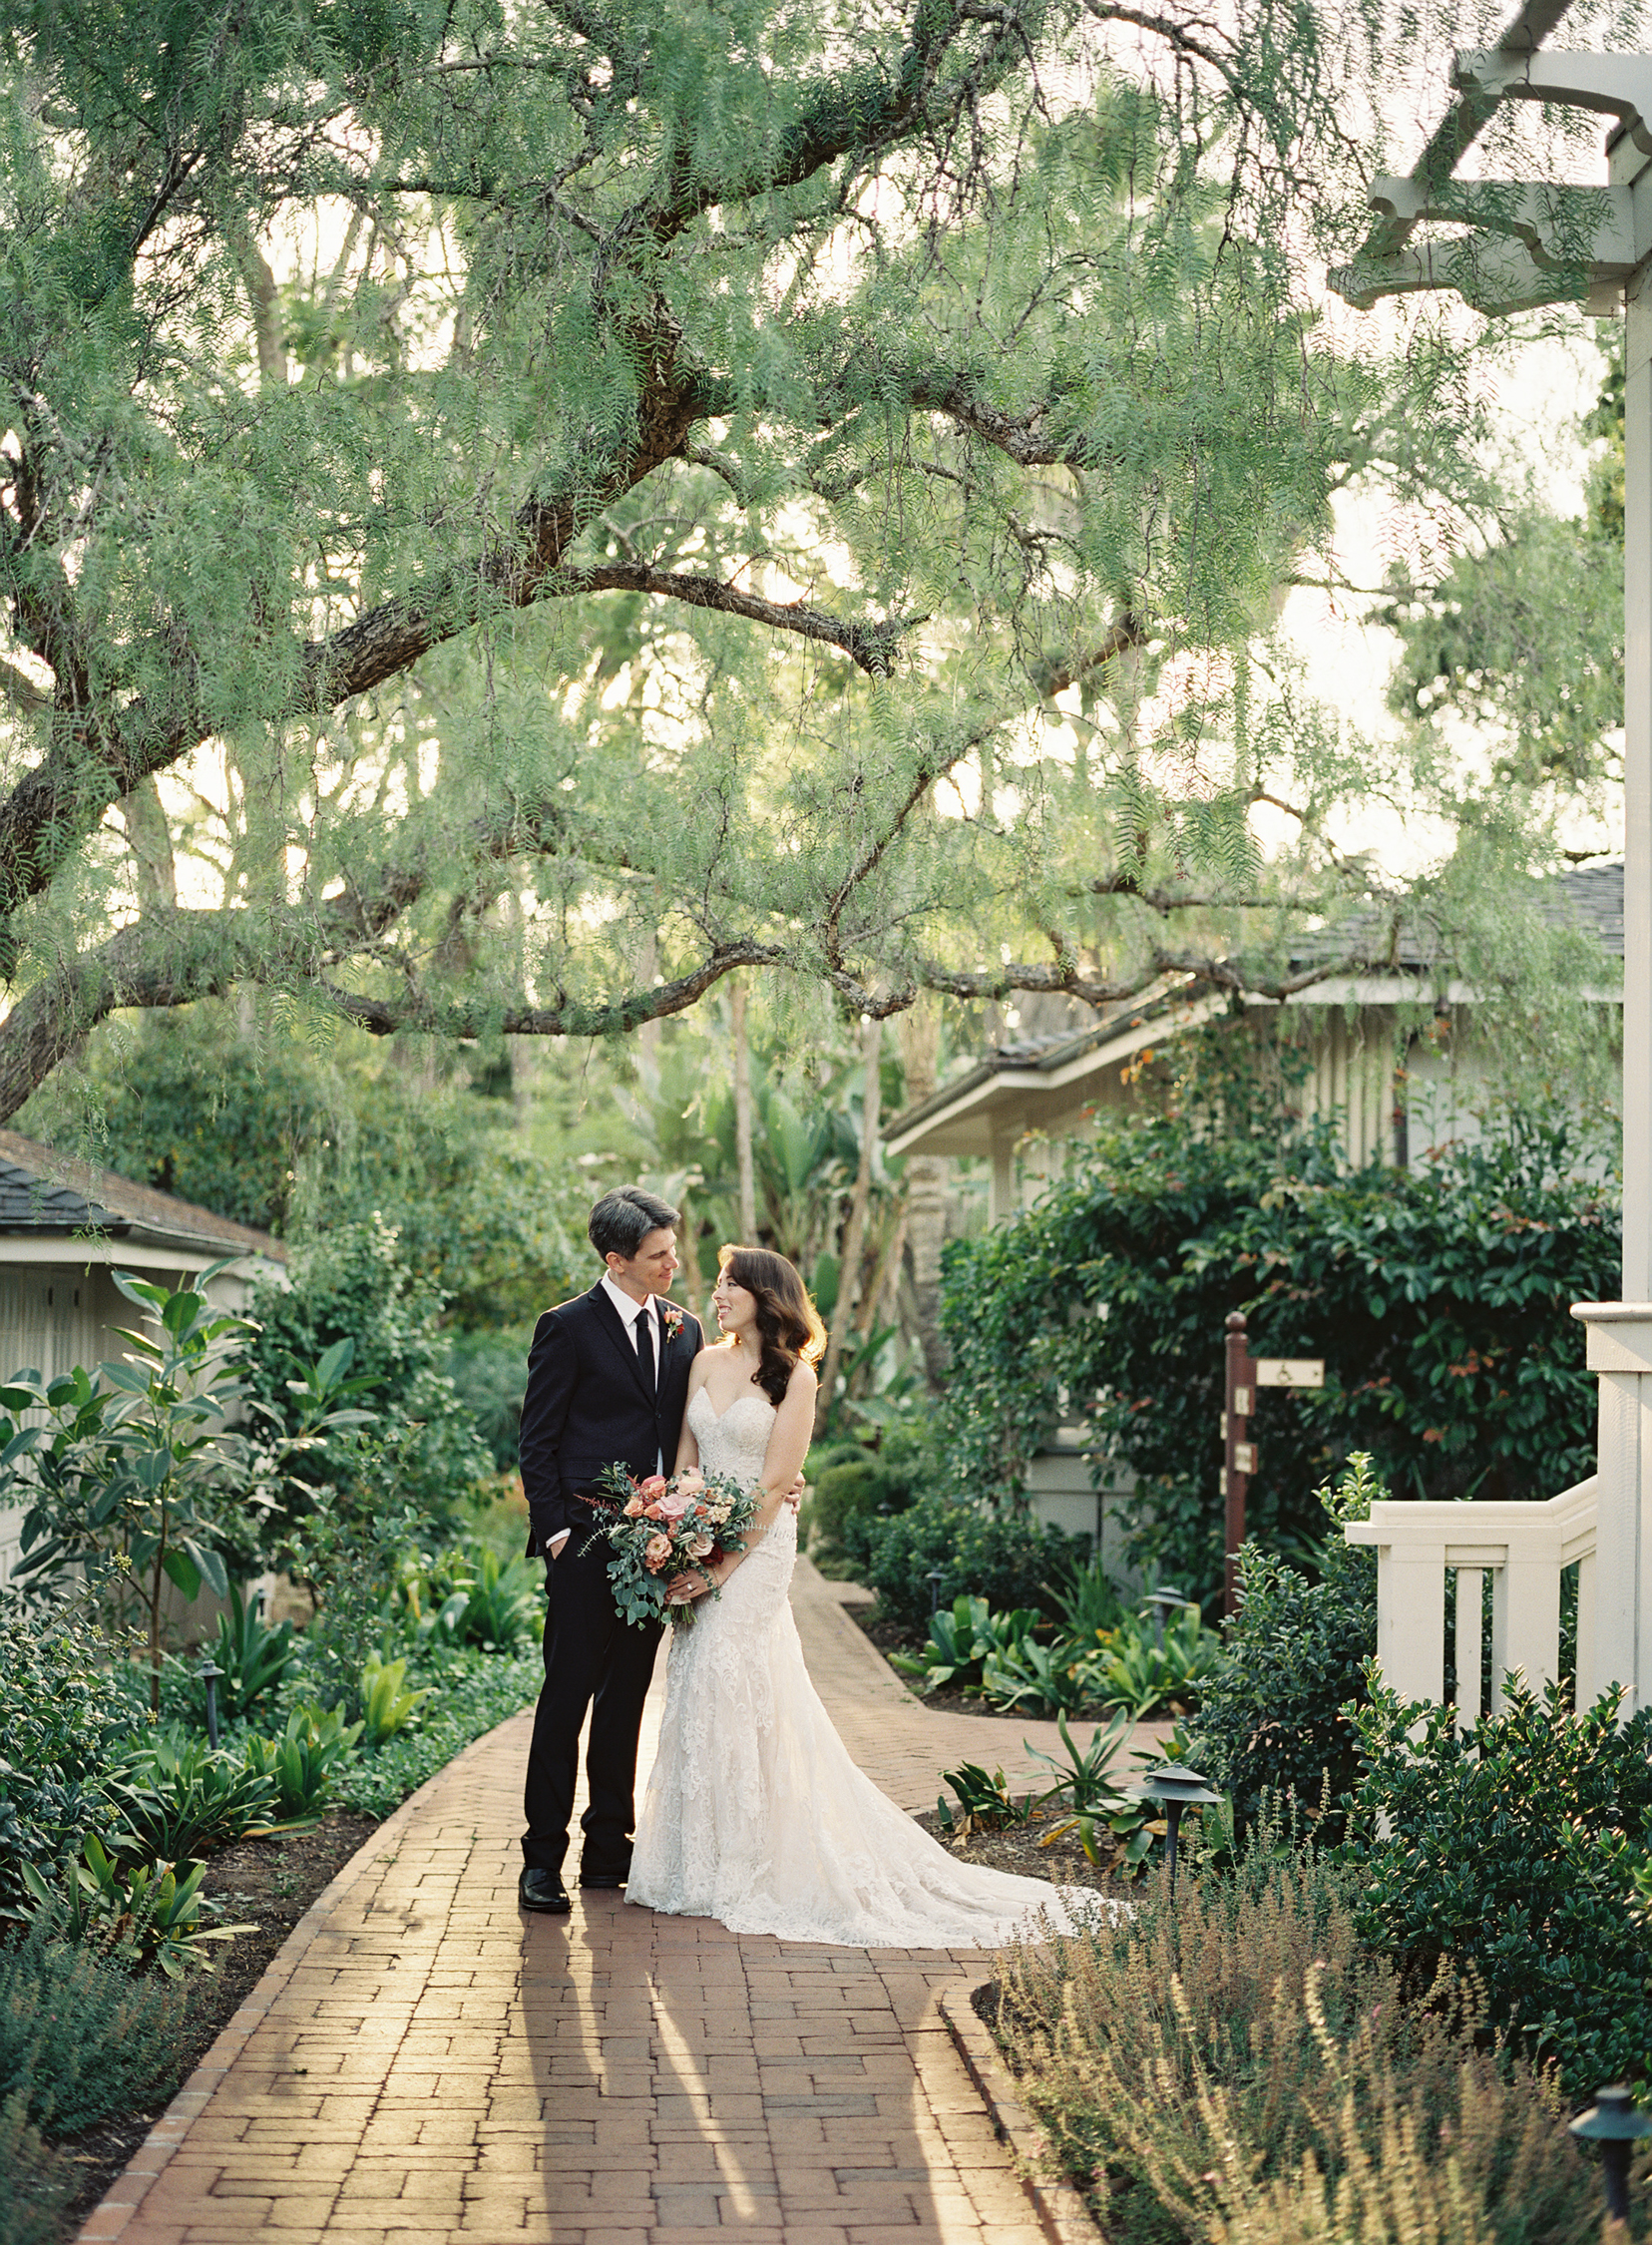 alegria-by-design-wedding-planner-planning-coordination-day-of-event-design-el-encanto-resort-riviera-garden-lily-pond-outdoor-red-navy (1).jpg